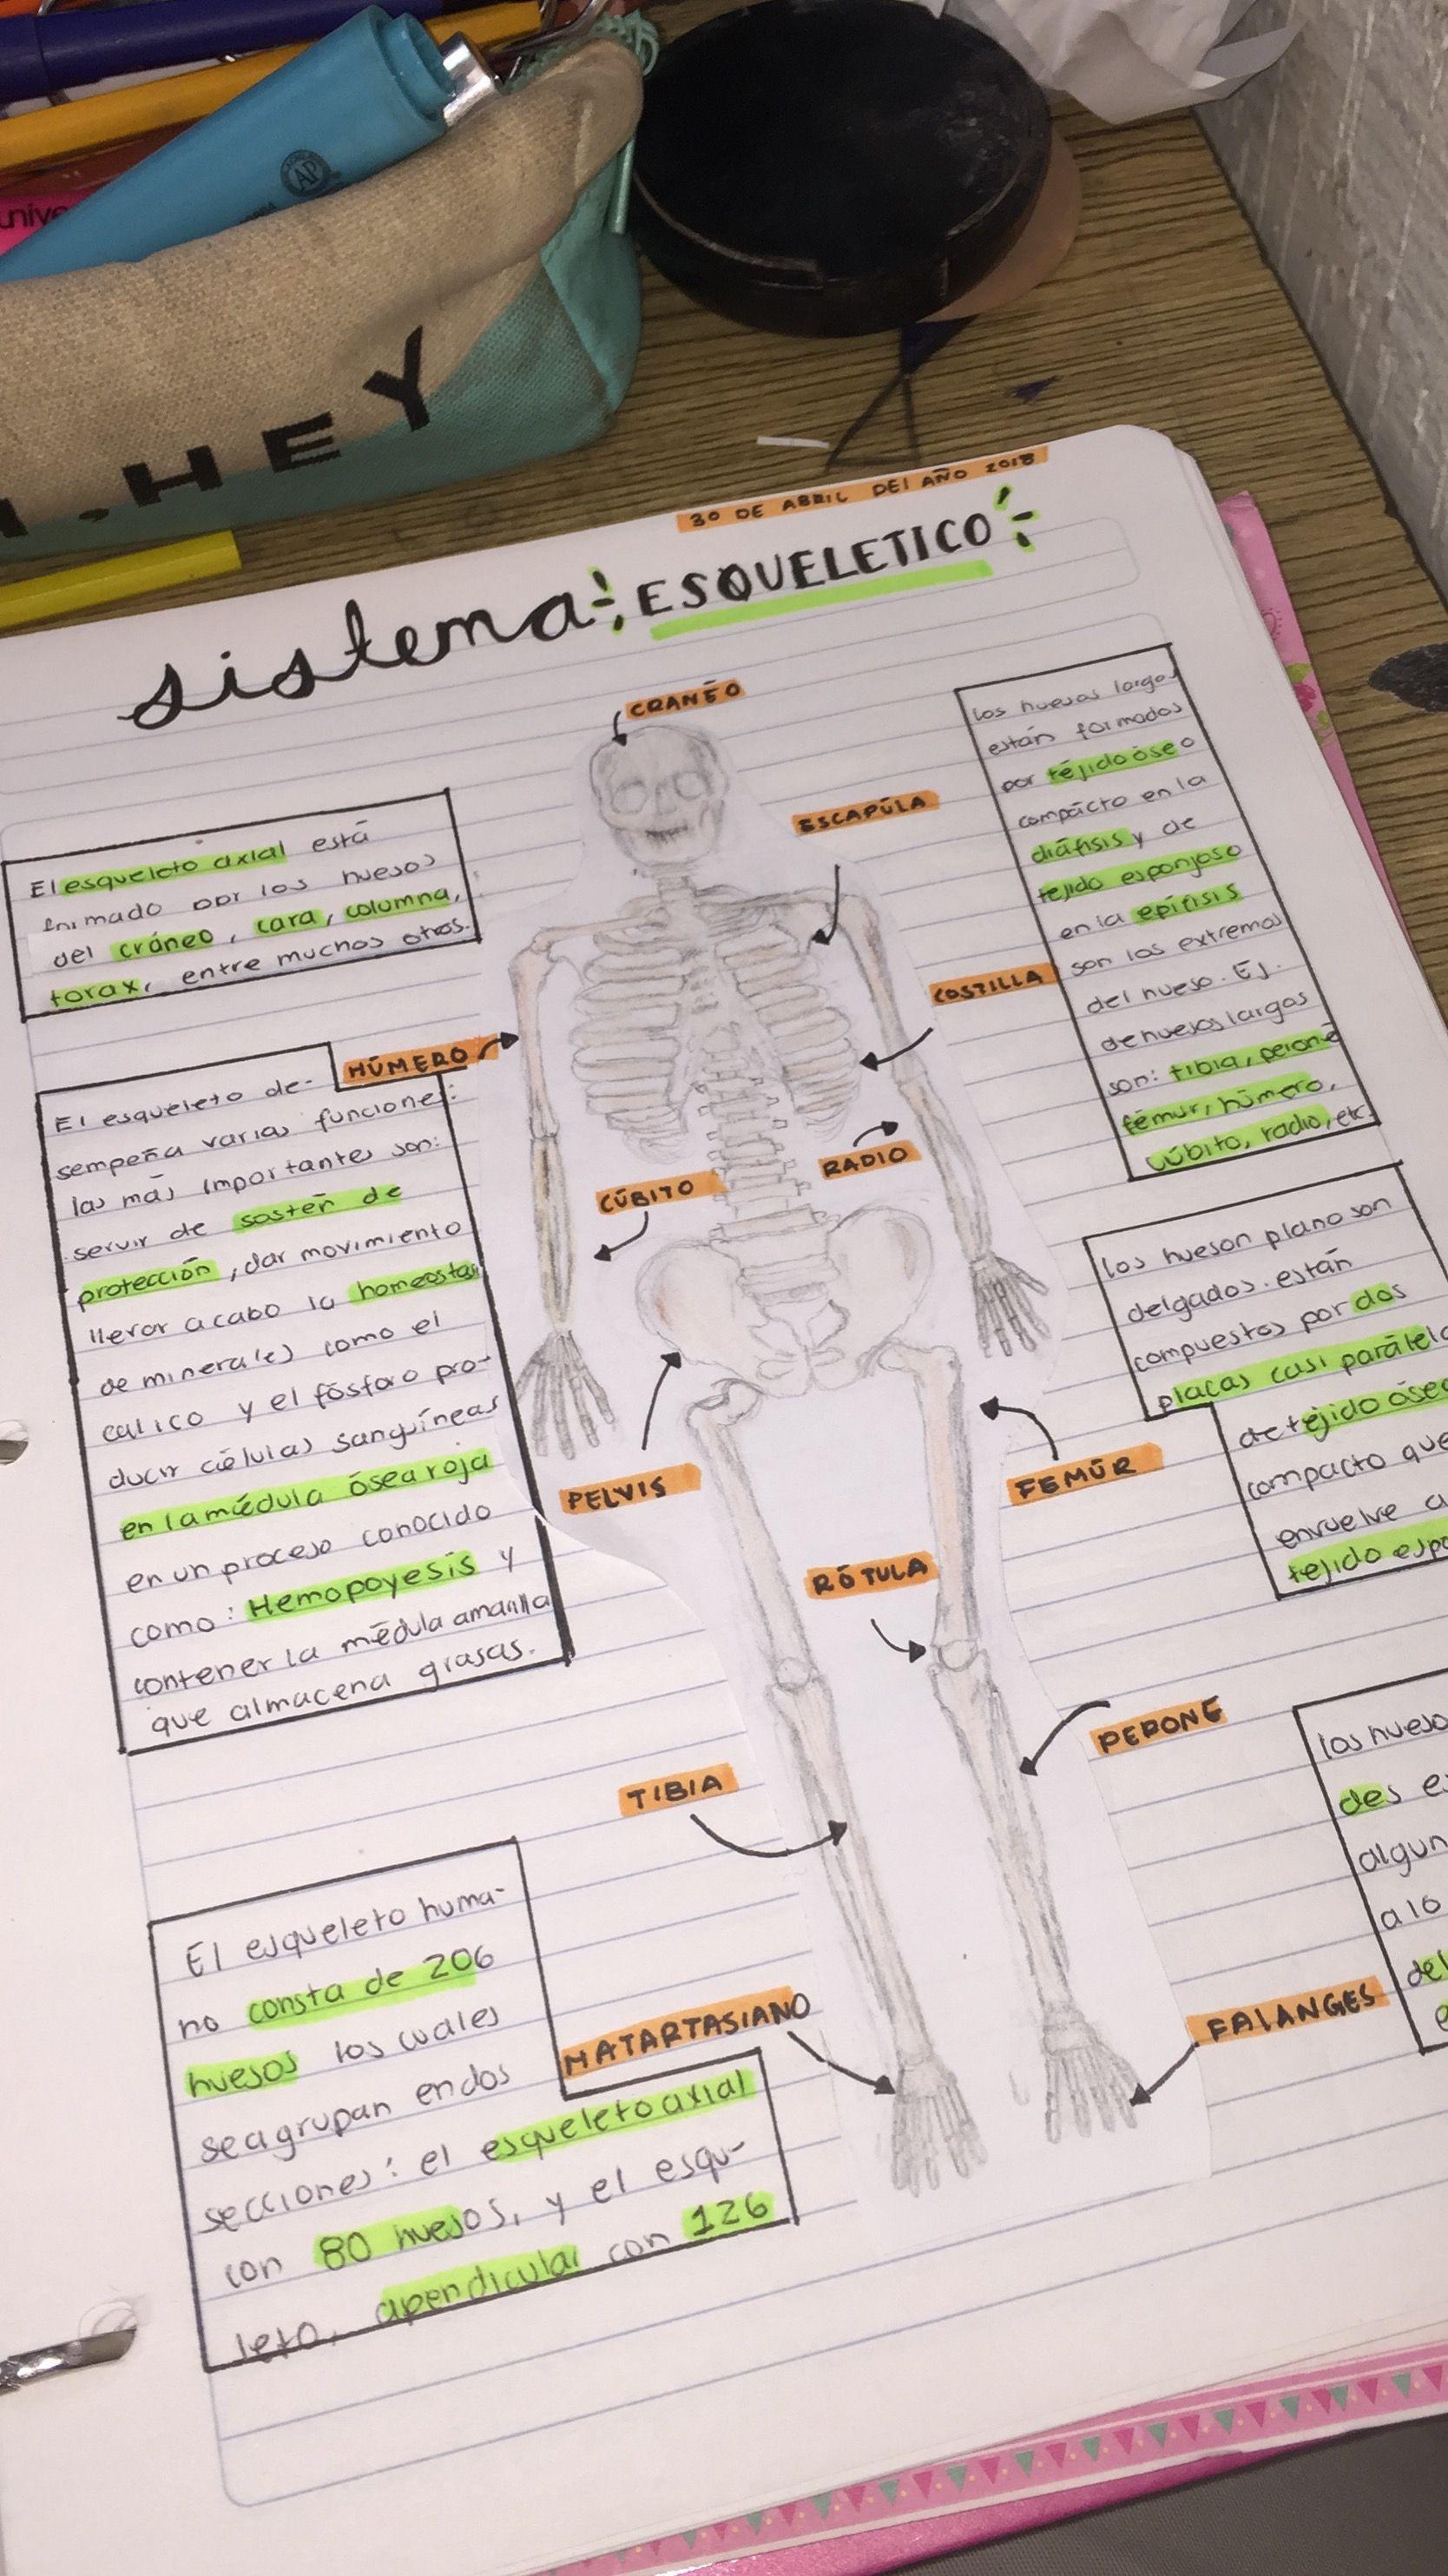 Sistema esqueletico | tareas | Pinterest | Sistema esquelético ...